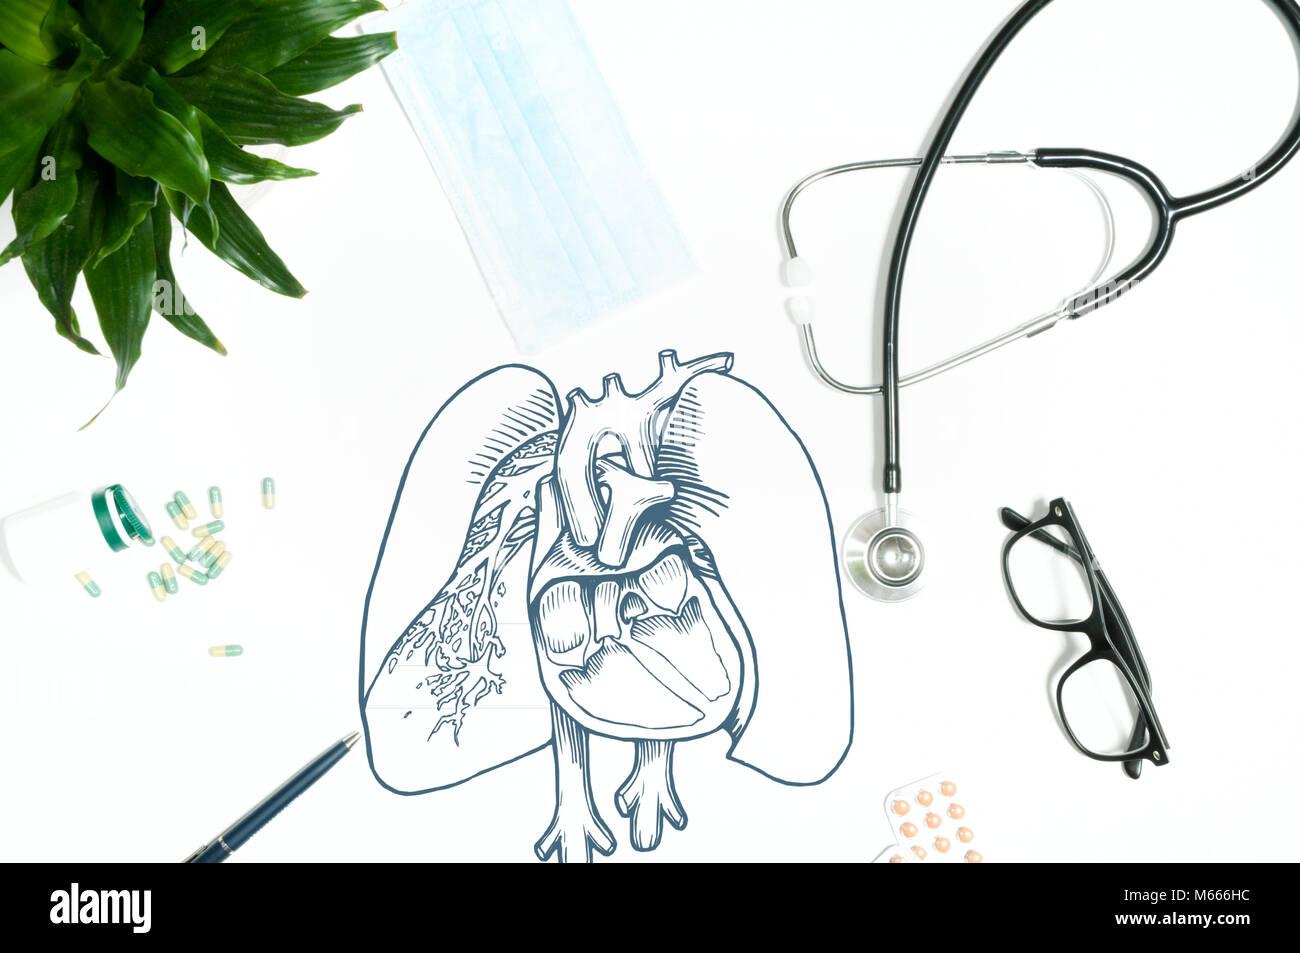 Fantastisch Wal Anatomie Dork Ideen - Anatomie Ideen - finotti.info